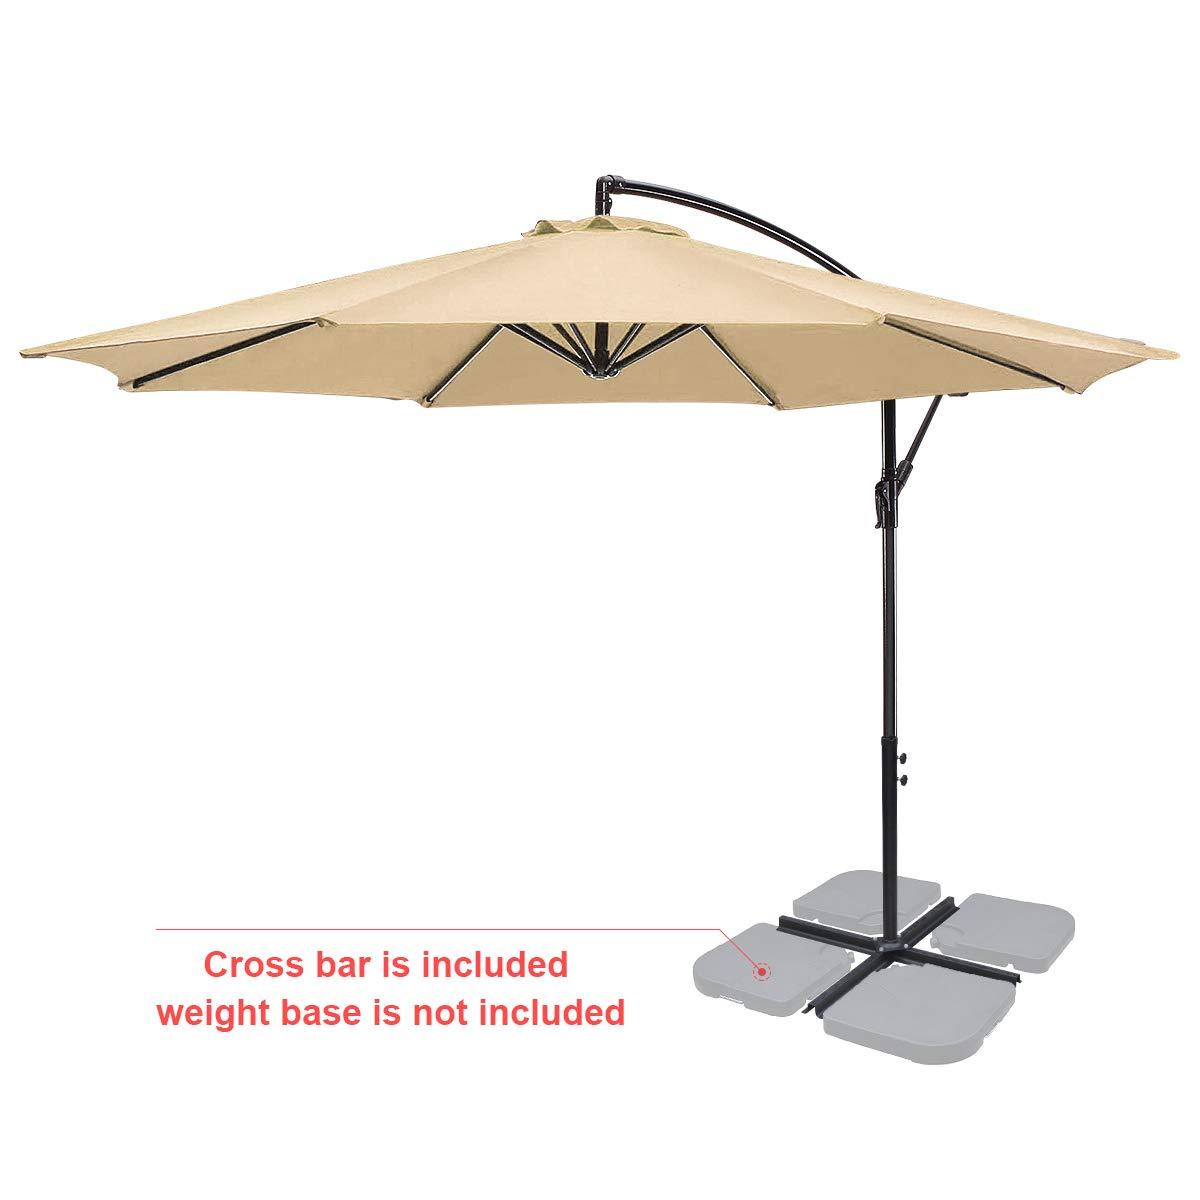 FRUITEAM 10 FT Patio Umbrellas Offset Cantilever Umbrella, Patio Hanging Umbrella Outdoor Market Umbrella with Crank & Cross Base, UPF100 UV Resistant and Waterproof, 8 Ribs Beige 1 Year Warranty